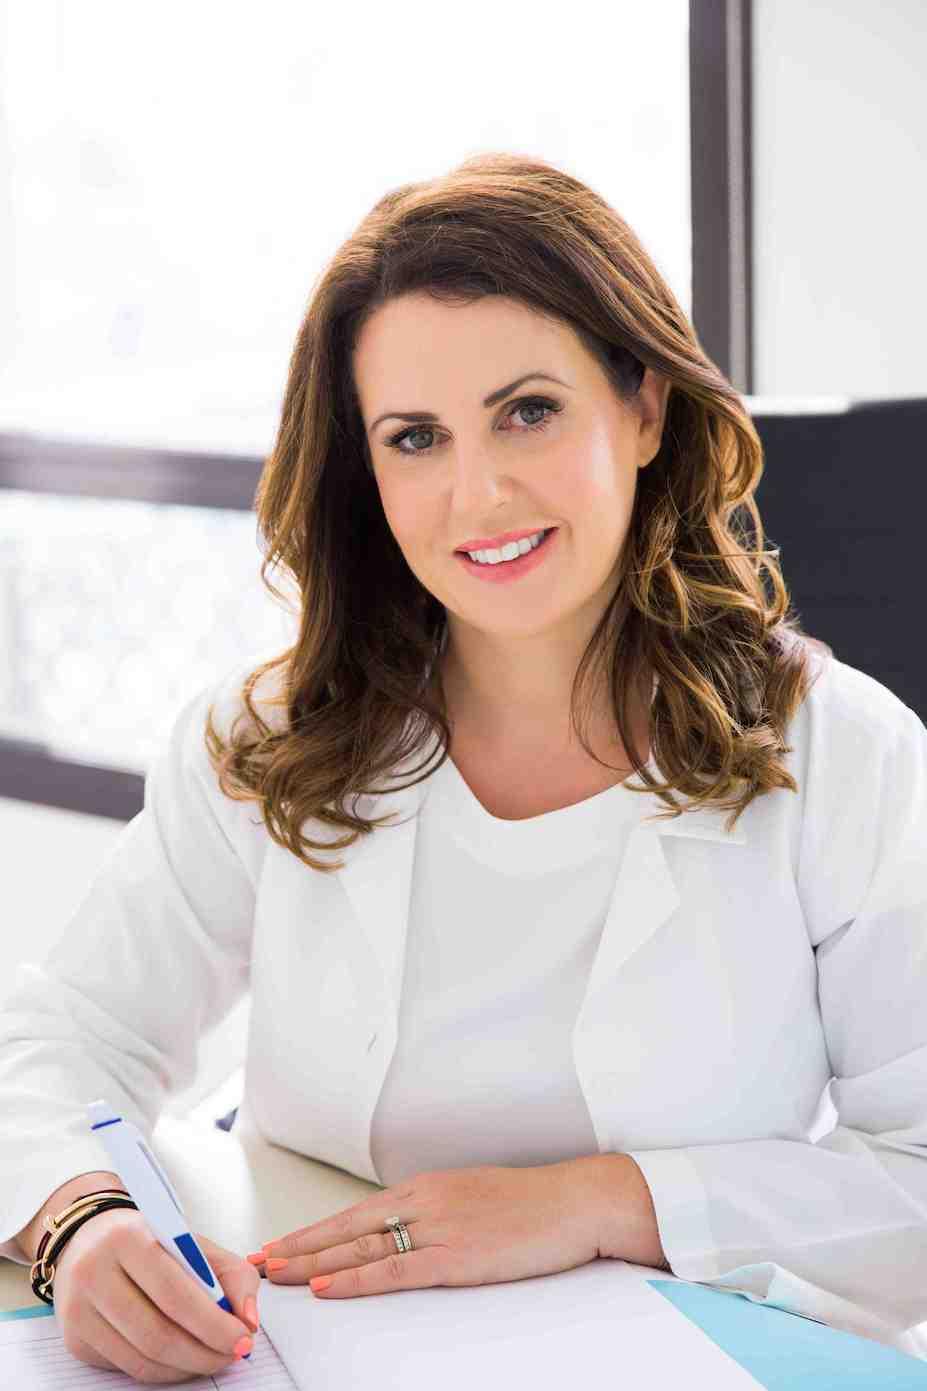 Skin & Beauty Expert, Rebecca Treston's Ten Top Wedding Beauty Tips